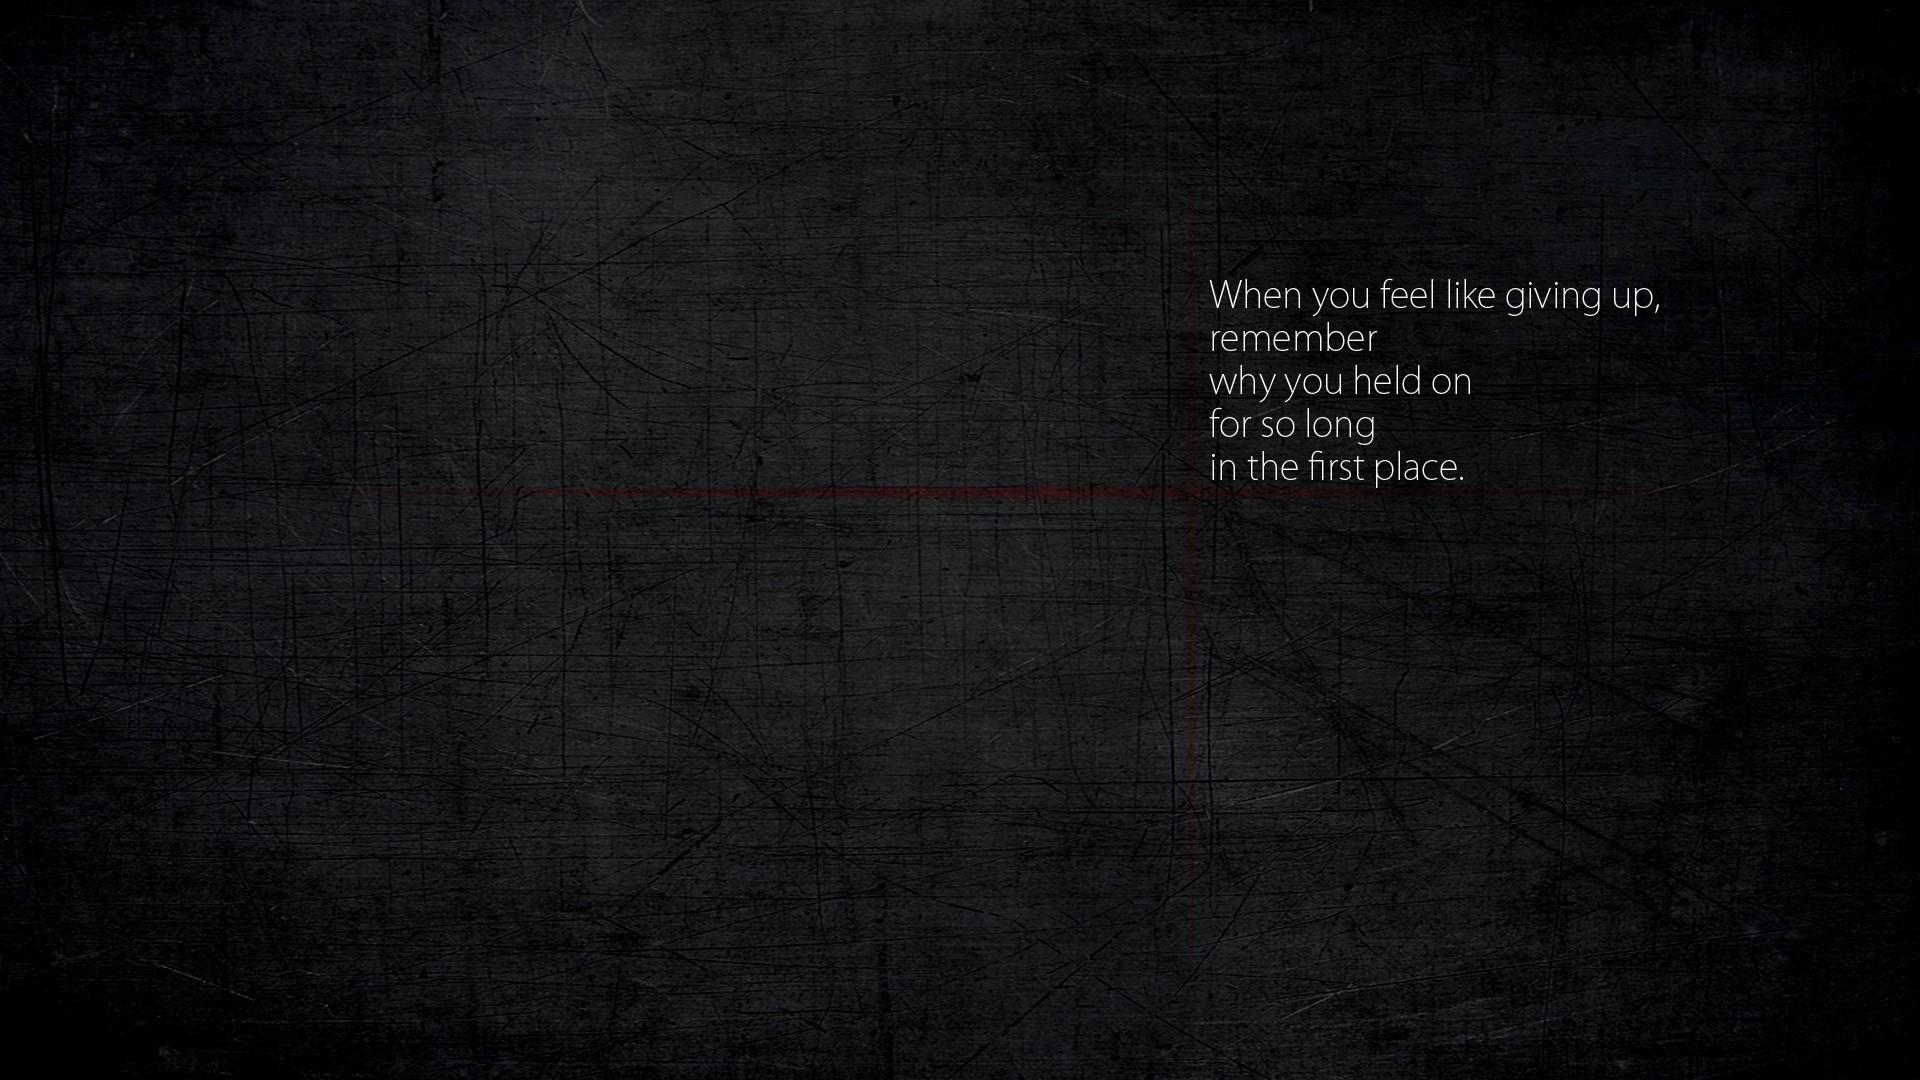 Motivational quote wallpaper wallpapertag - Motivational desktop wallpaper hd ...